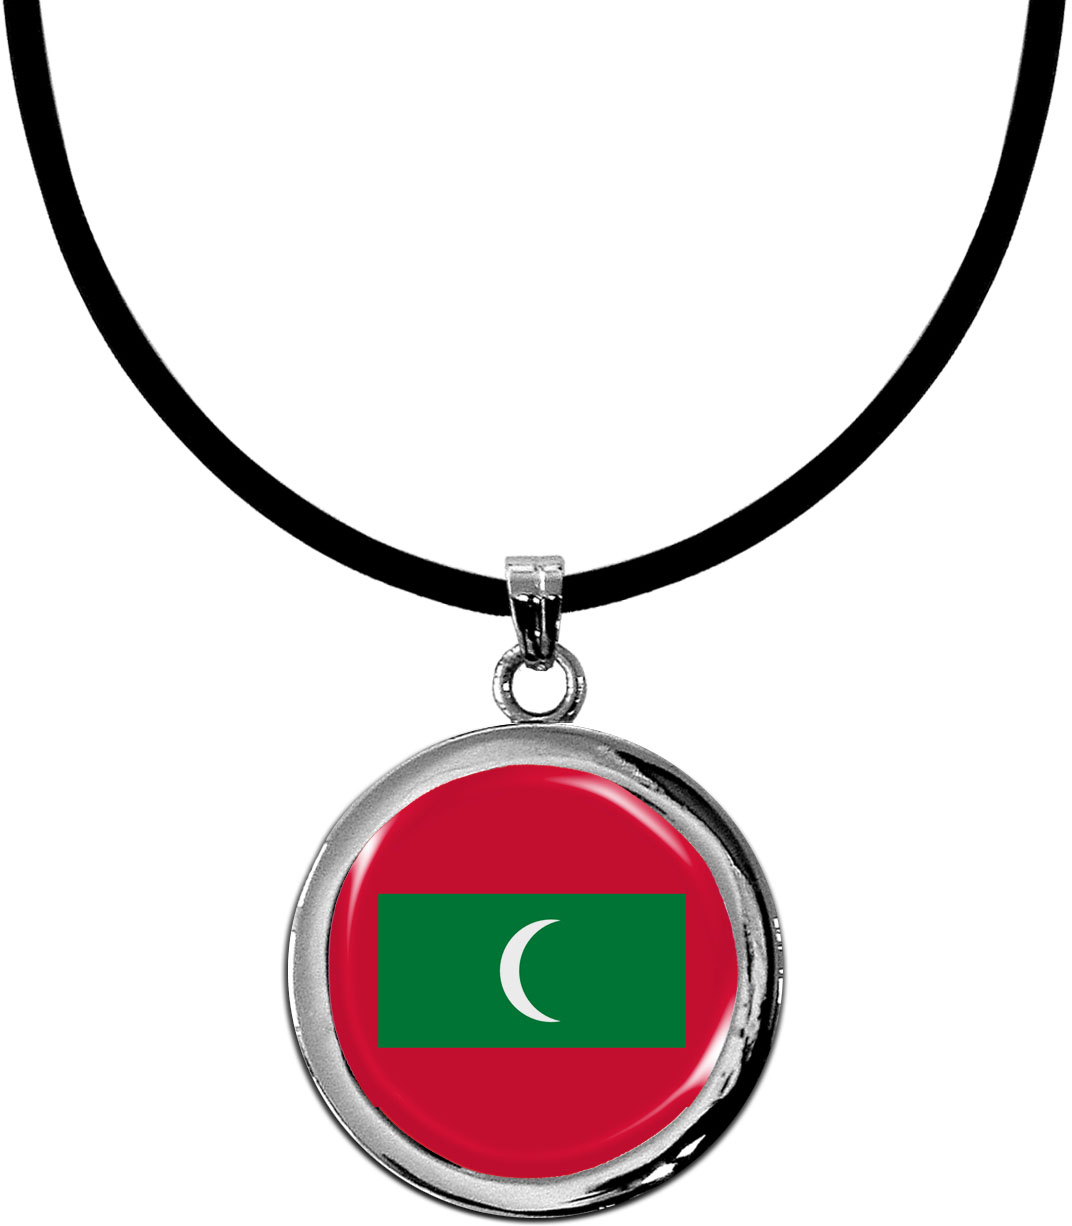 Kettenanhänger / Malediven / Silikonband mit Silberverschluss